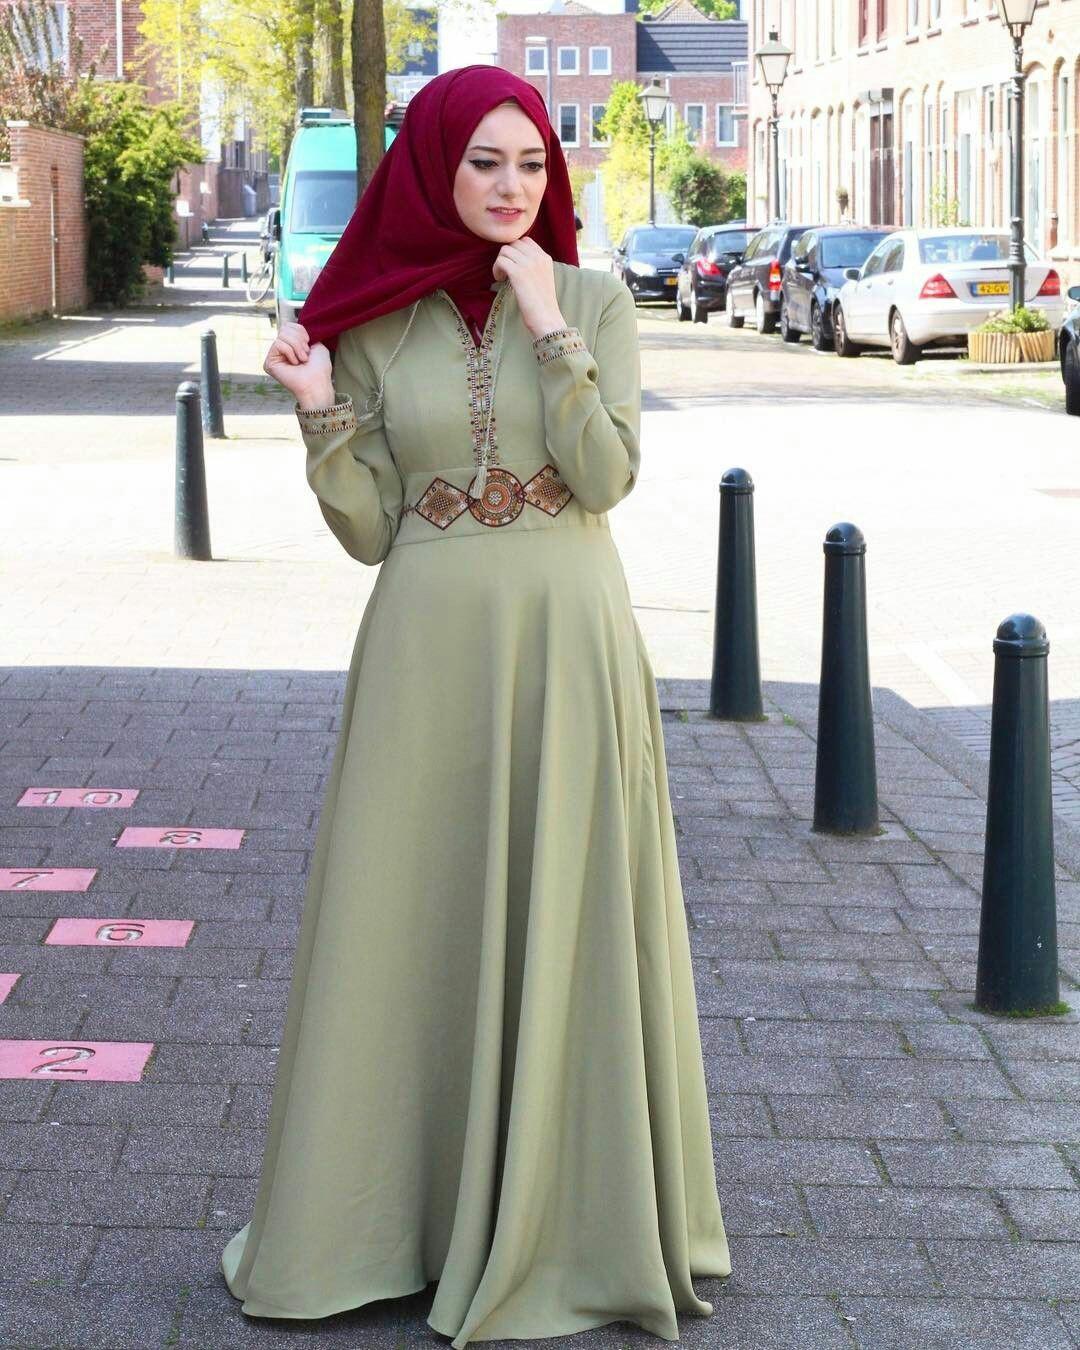 4fdc4f2376228 موديلات حجابات للمناسبات 2018 - مجلة كاميليا